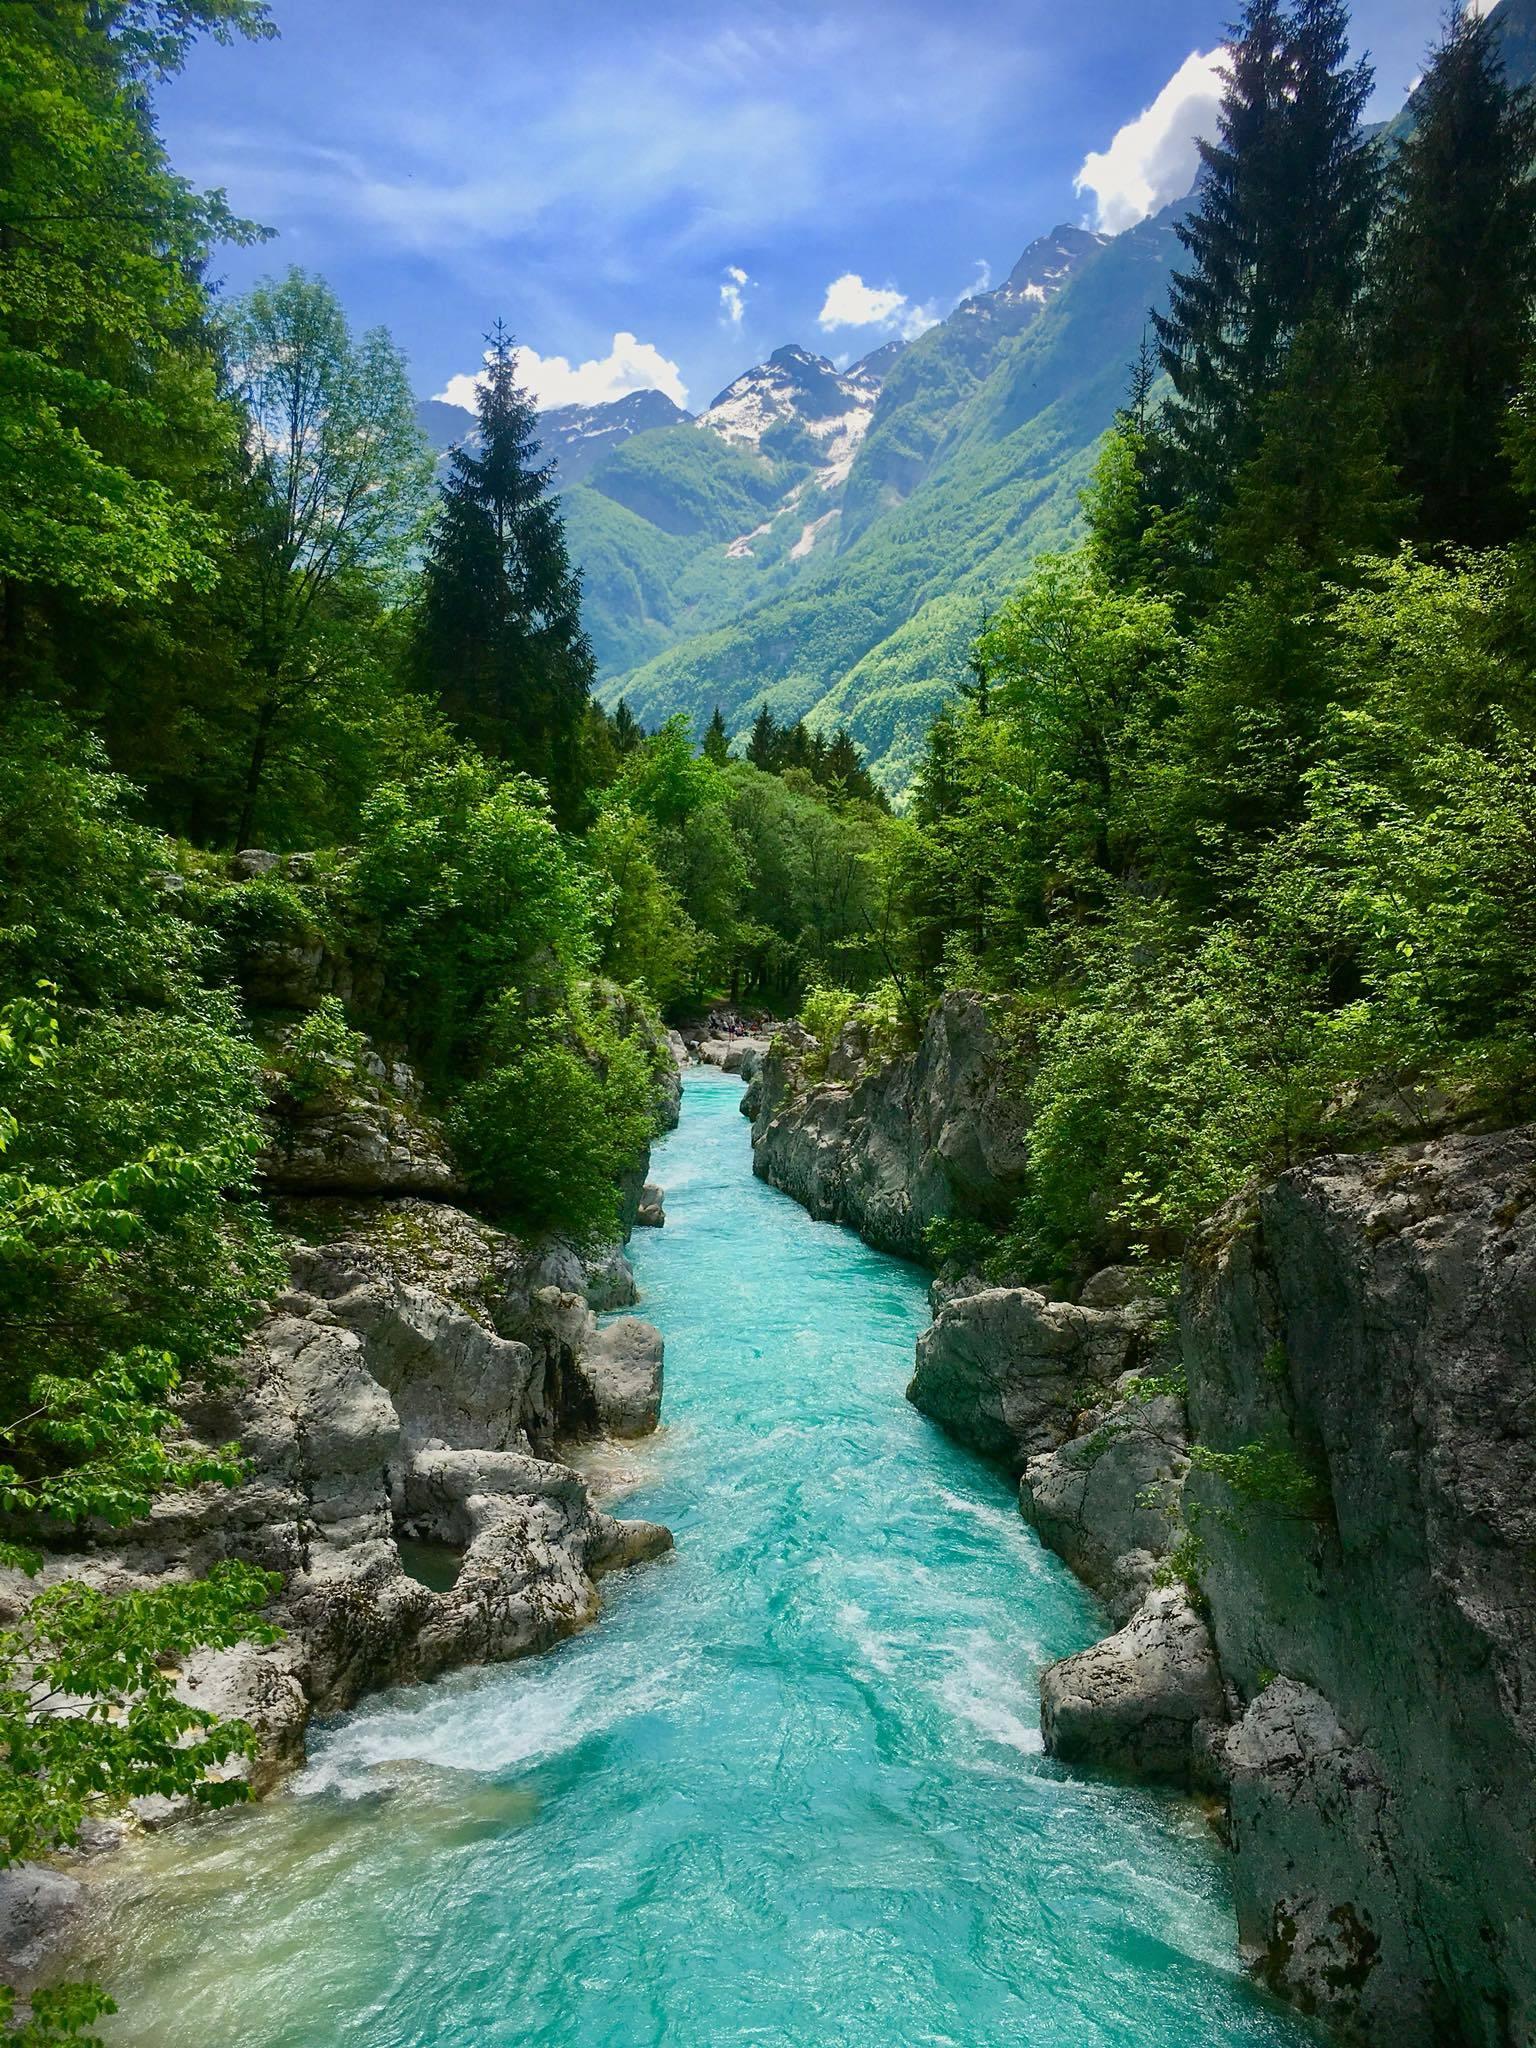 Photo 1: La vallée de Soča et sa rivière émeraude